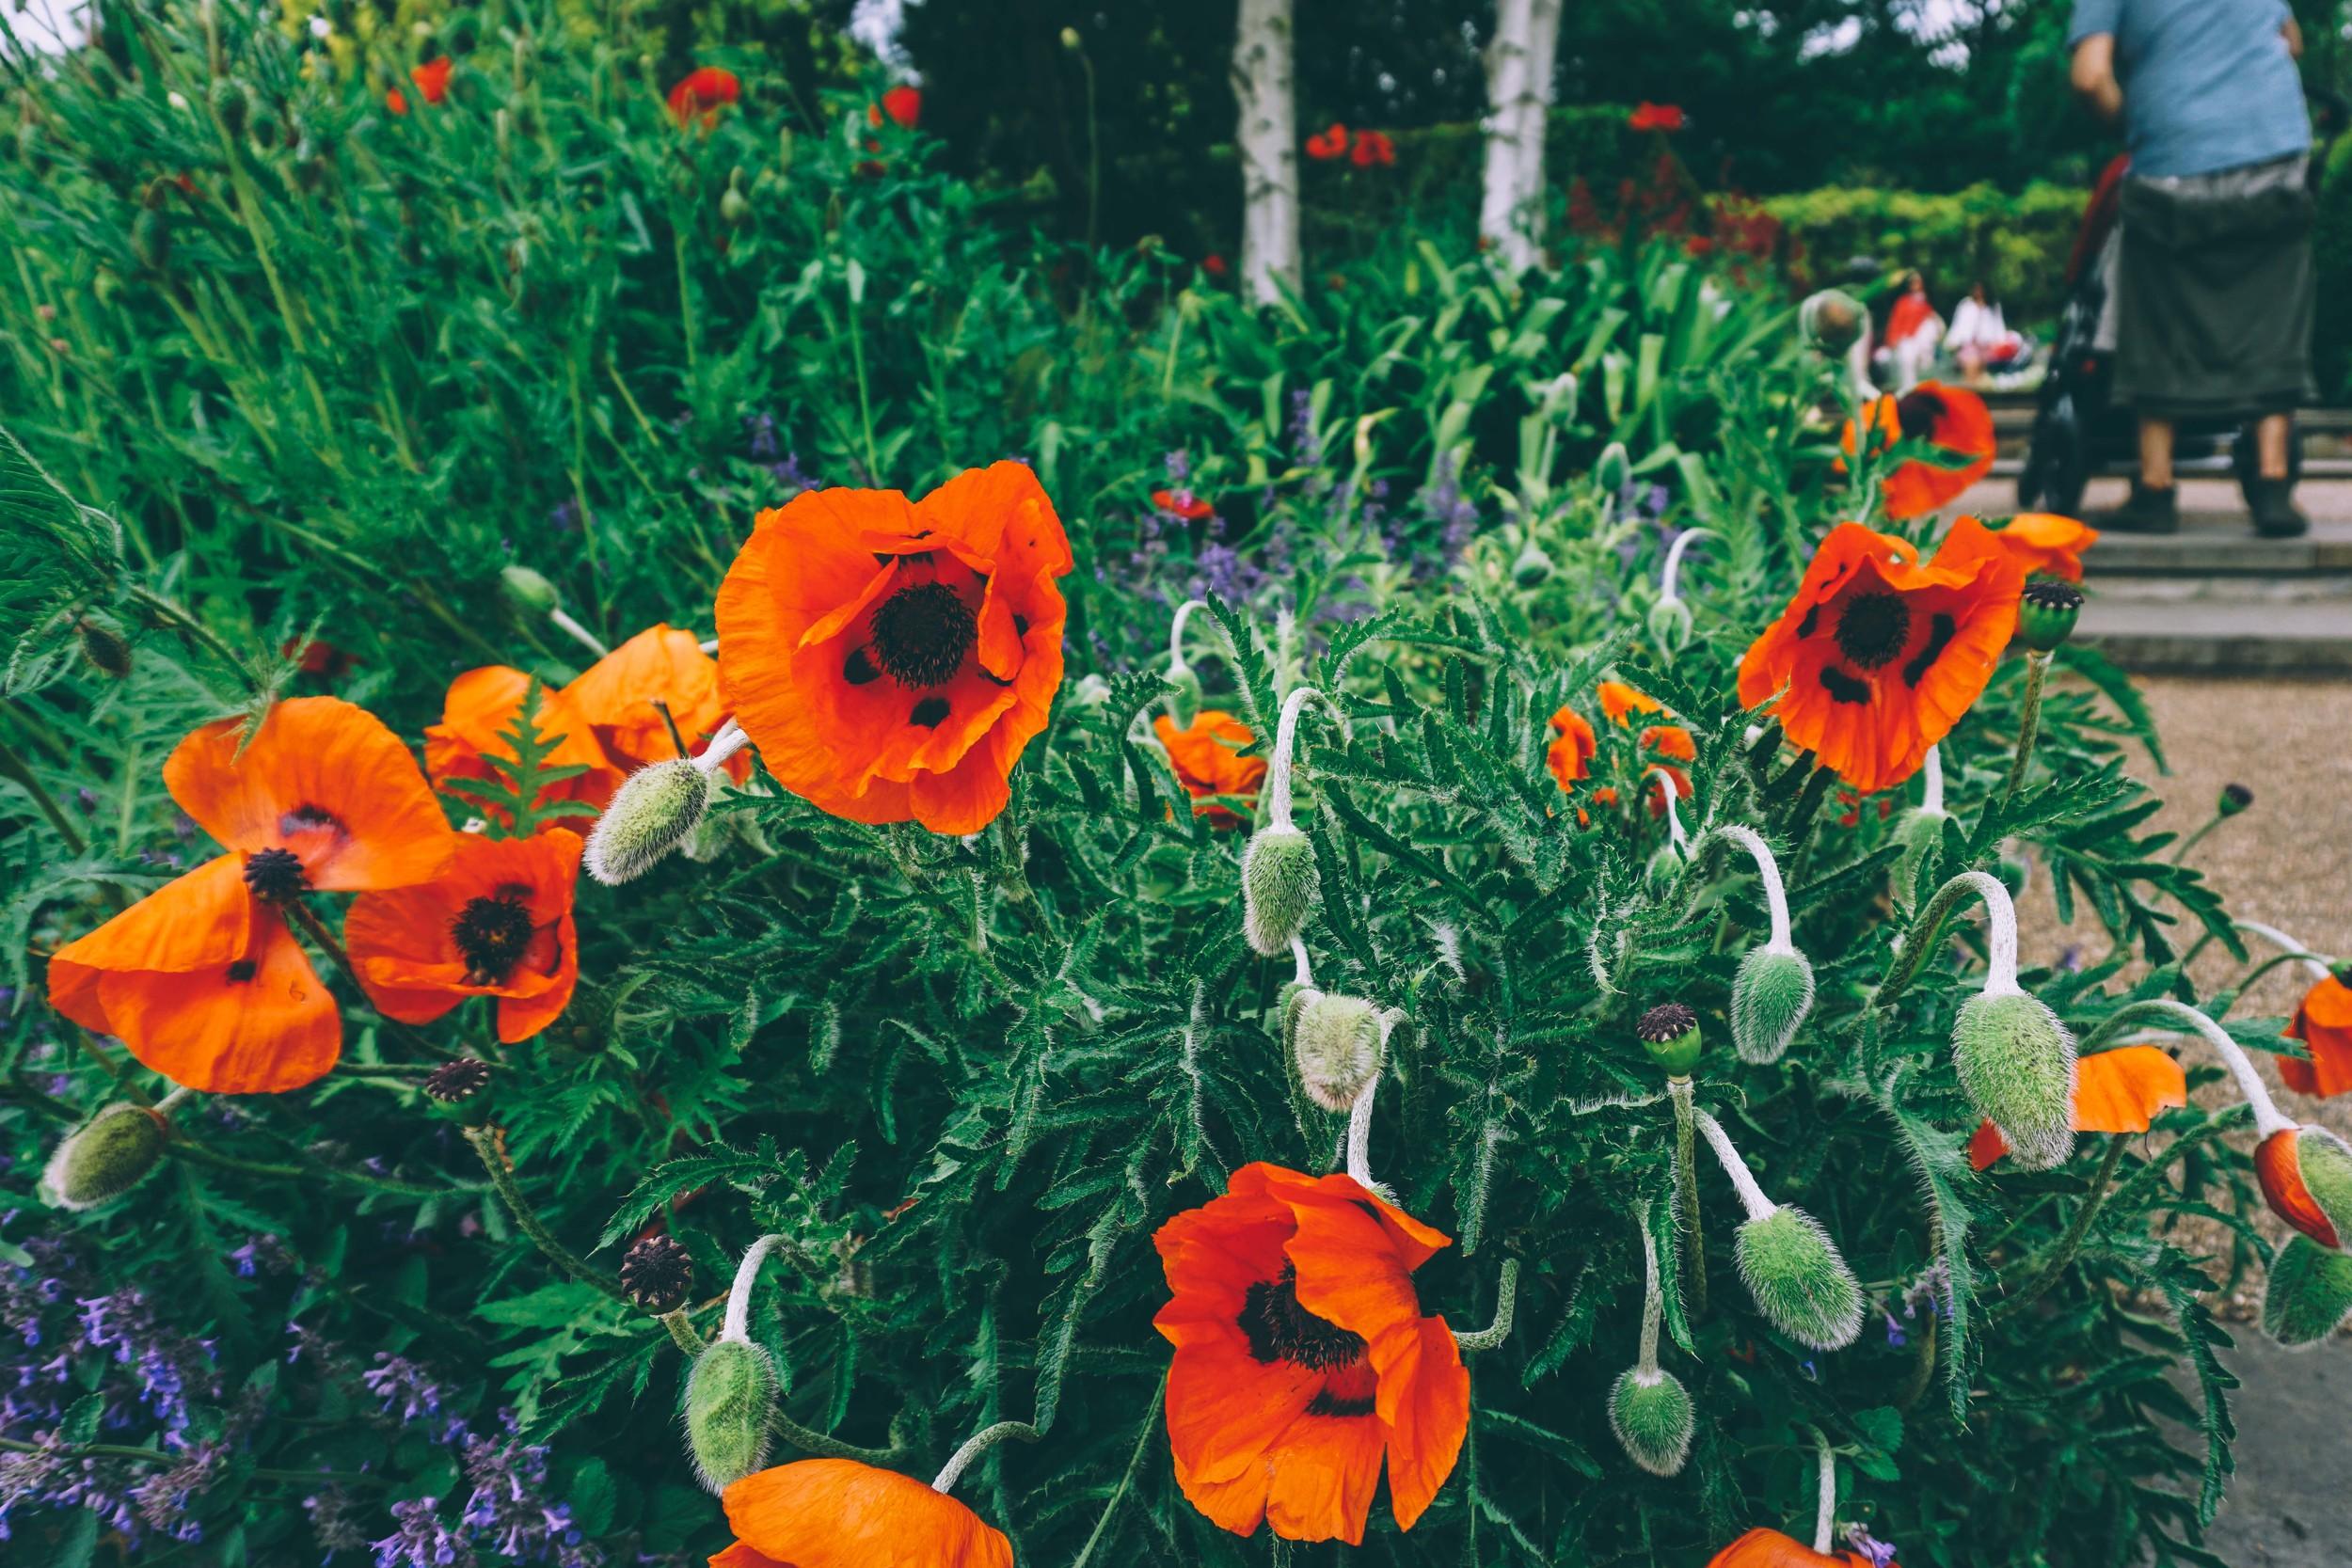 Poppies in Kensington Palace Gardens